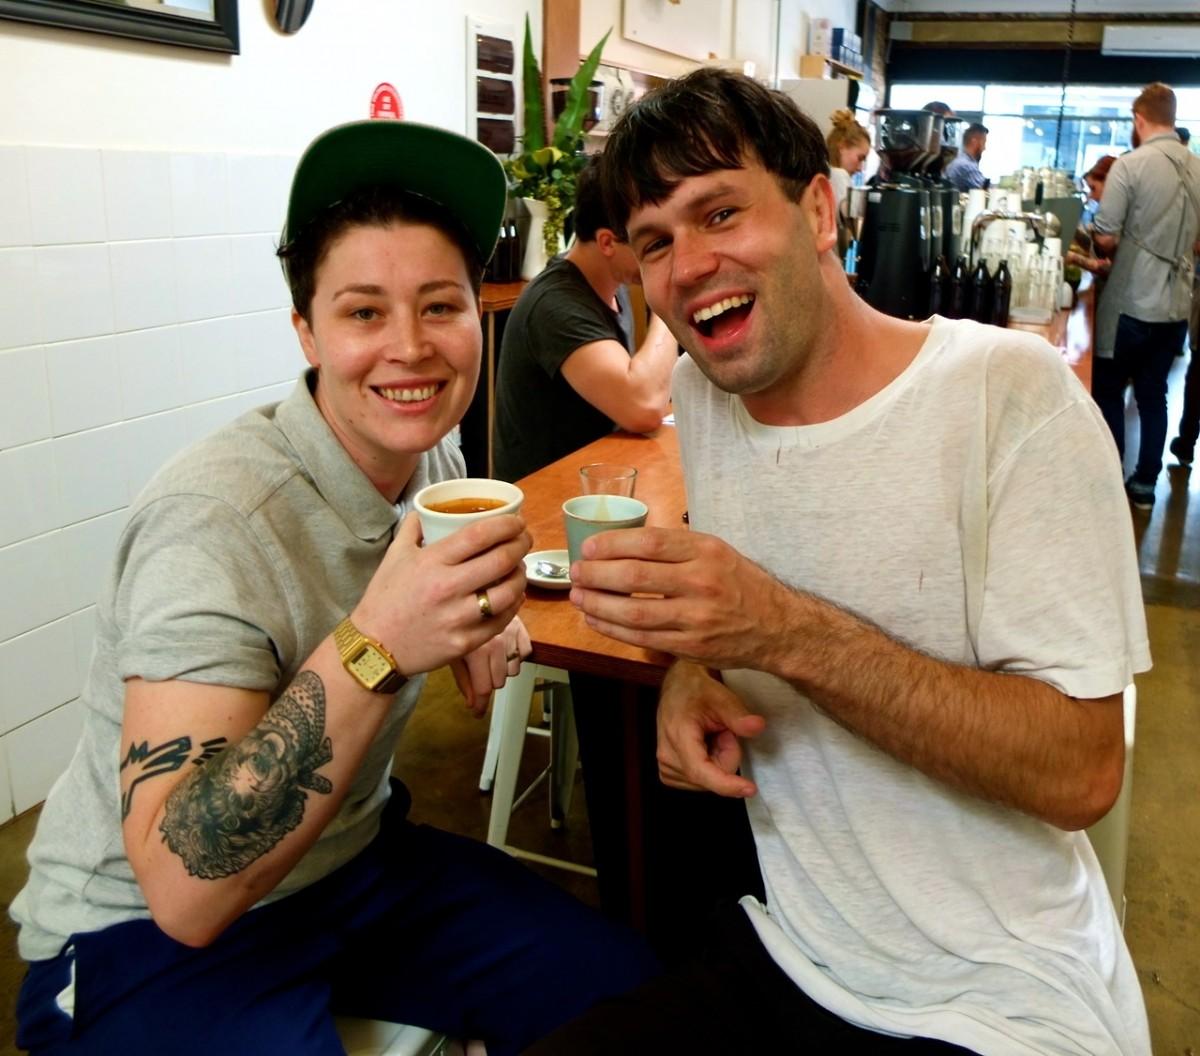 Coffee date with Mia Oopsididitagain Haberdashery-Jones